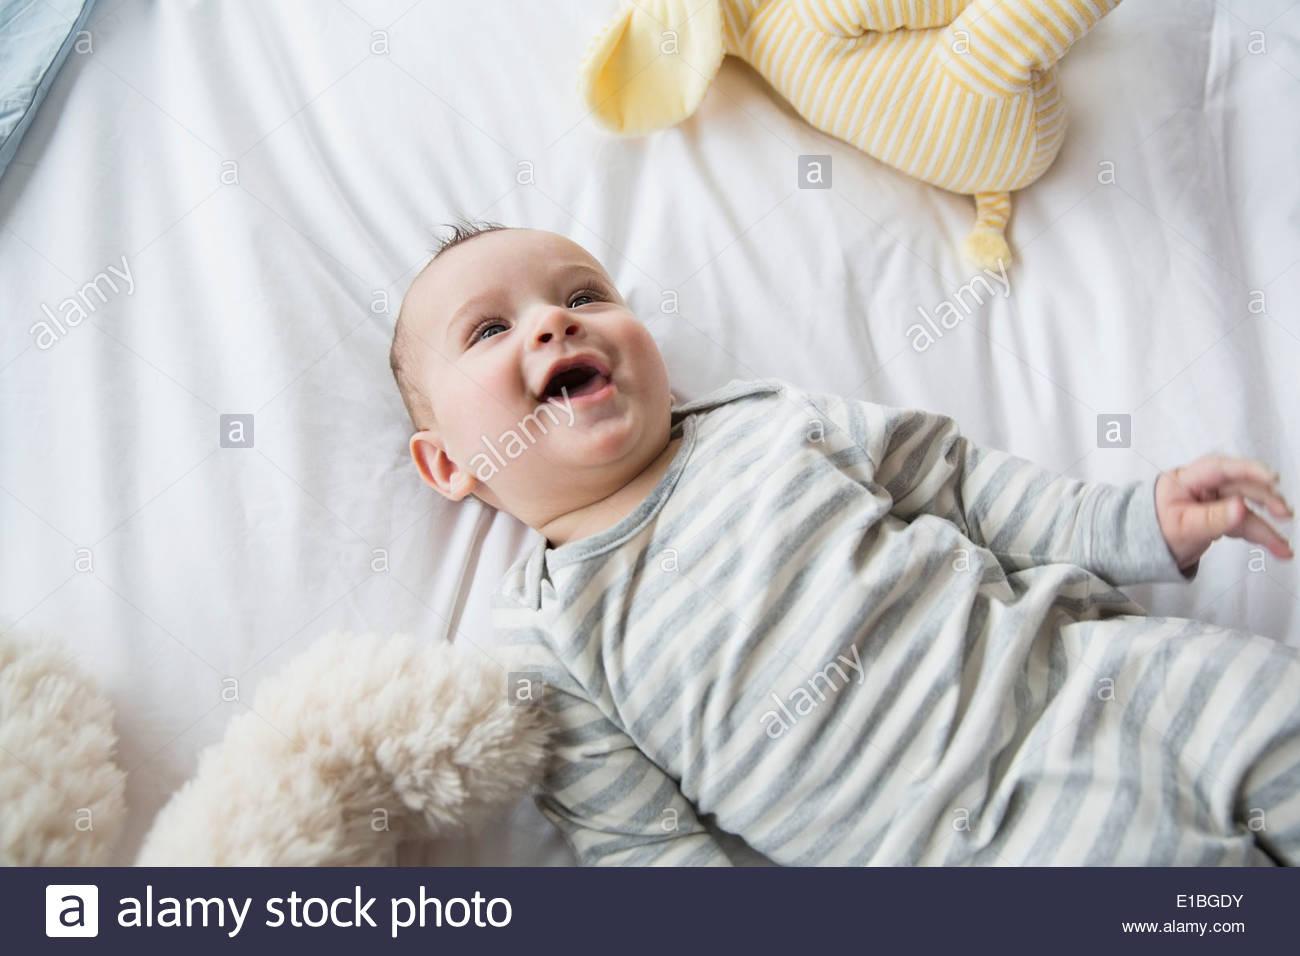 Laughing baby posa sul letto Immagini Stock